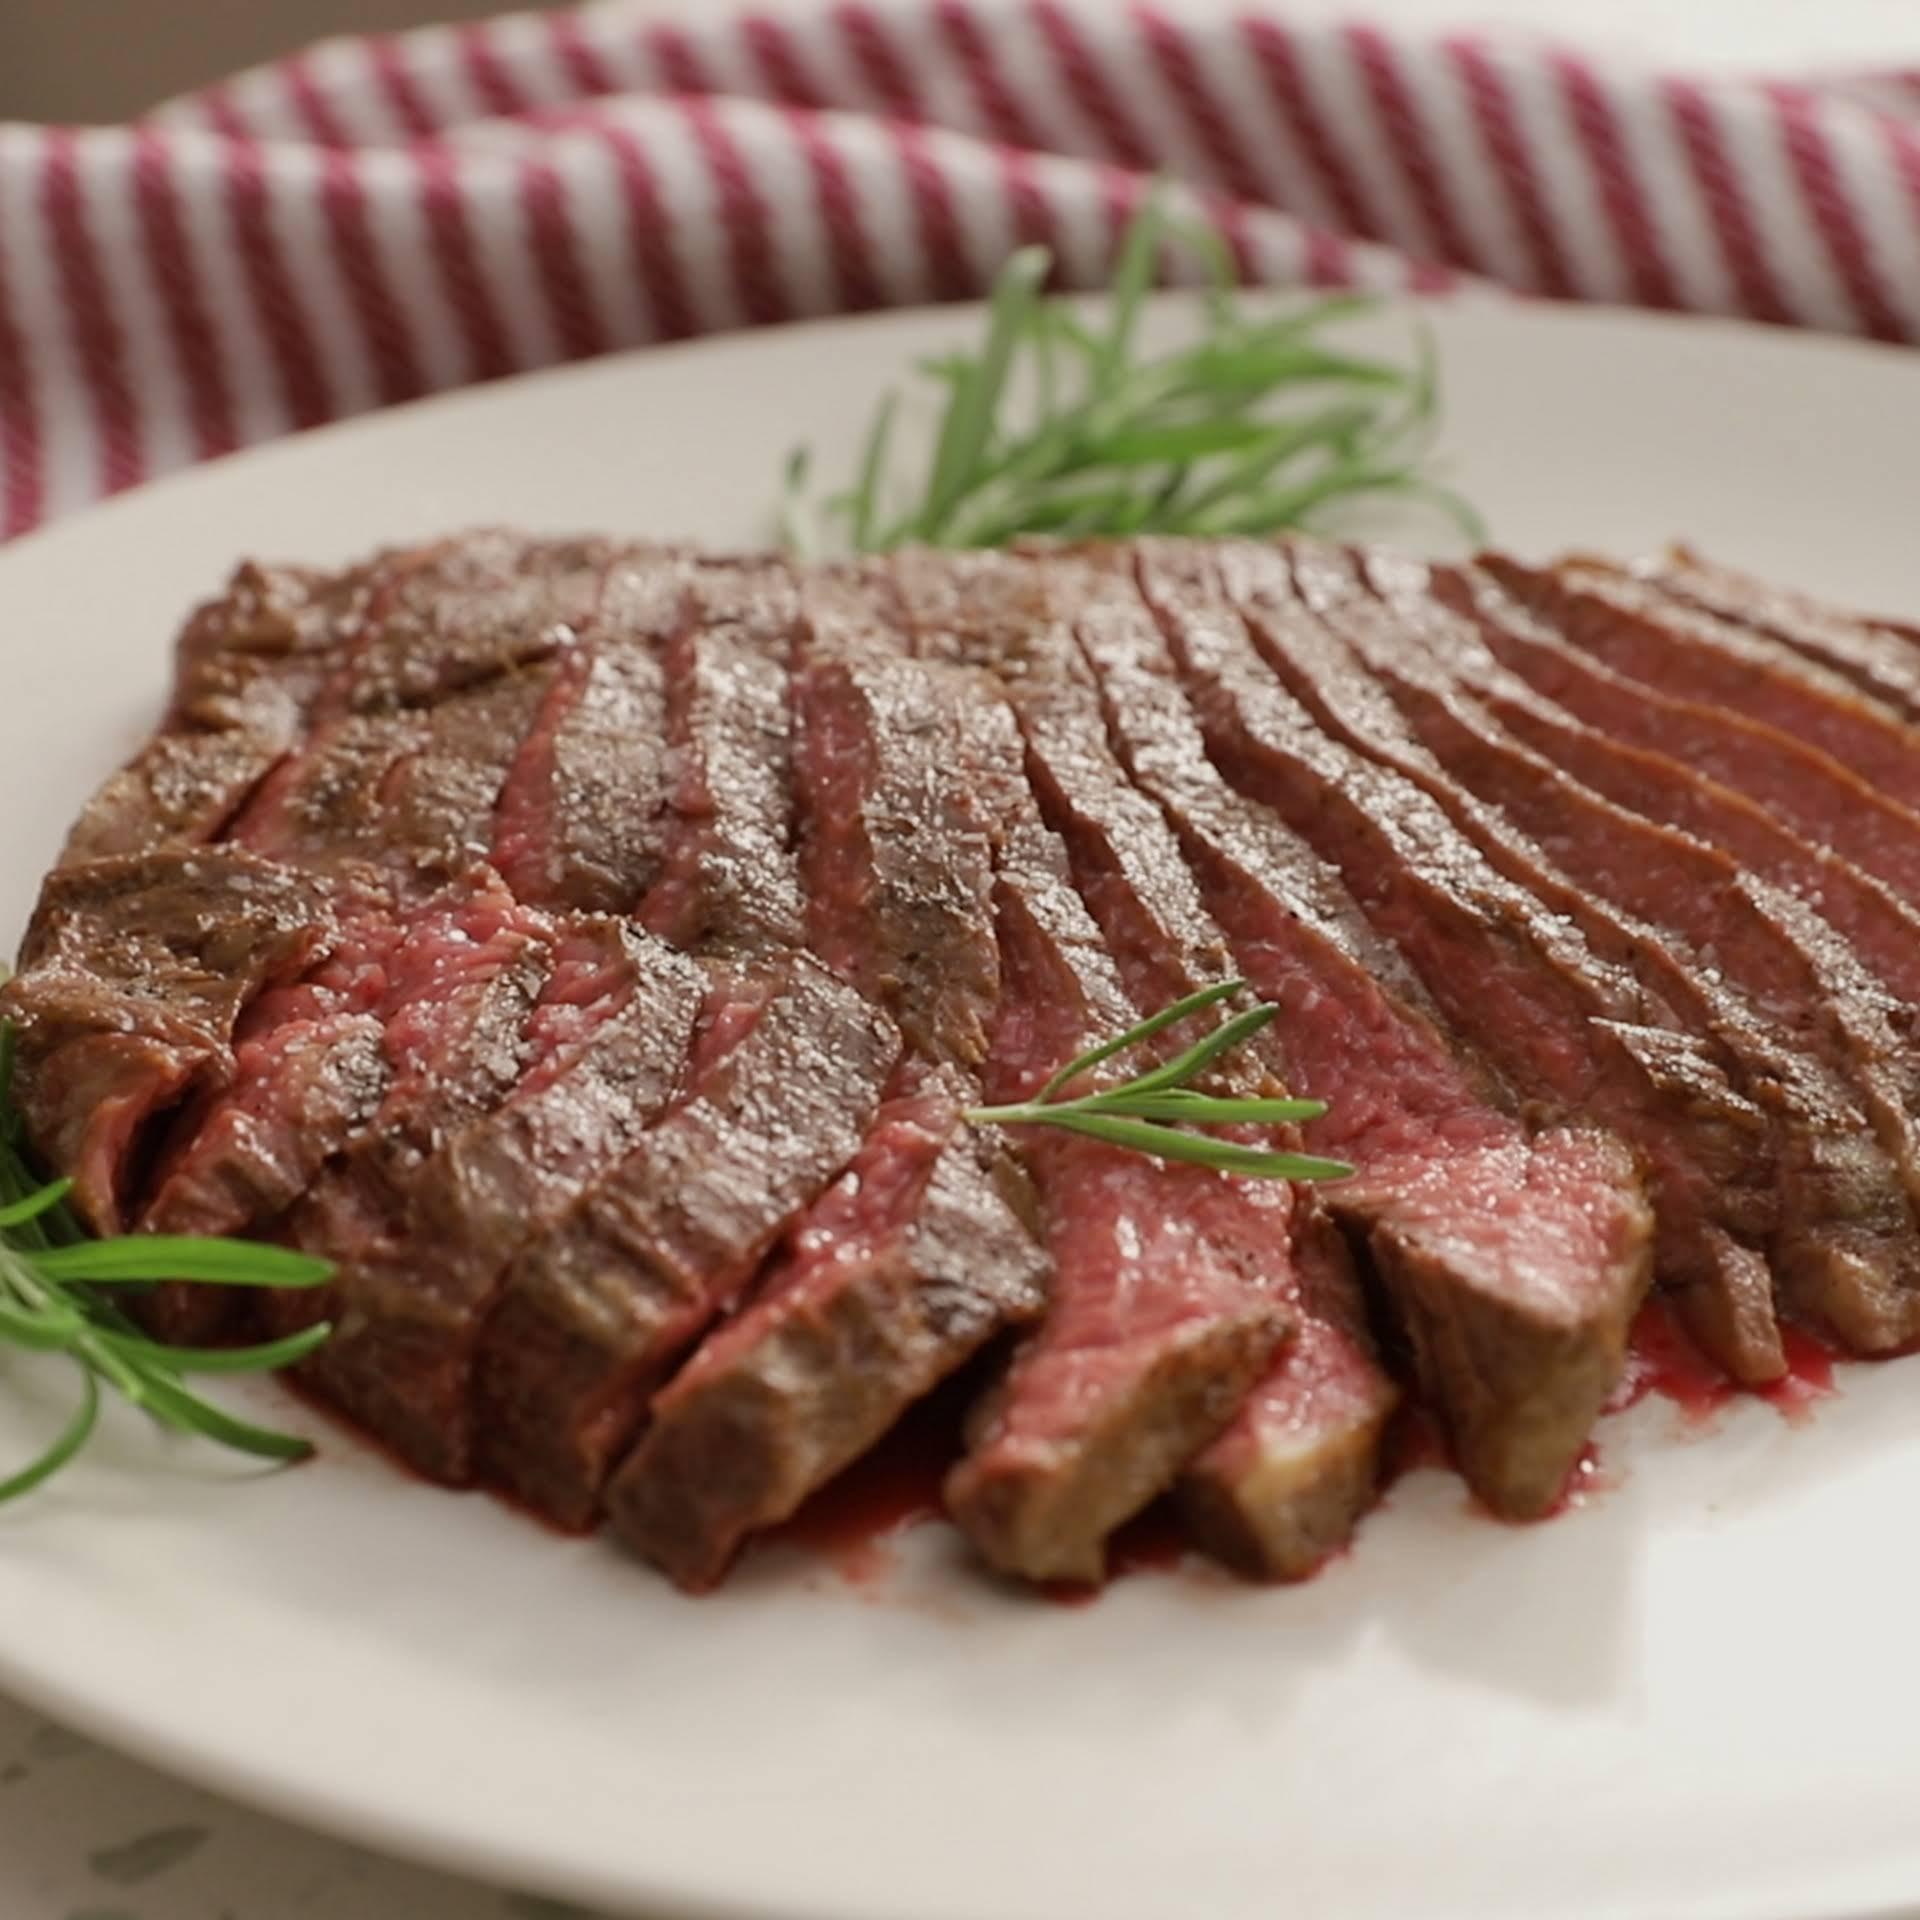 Oven-Roasted Flank Steak